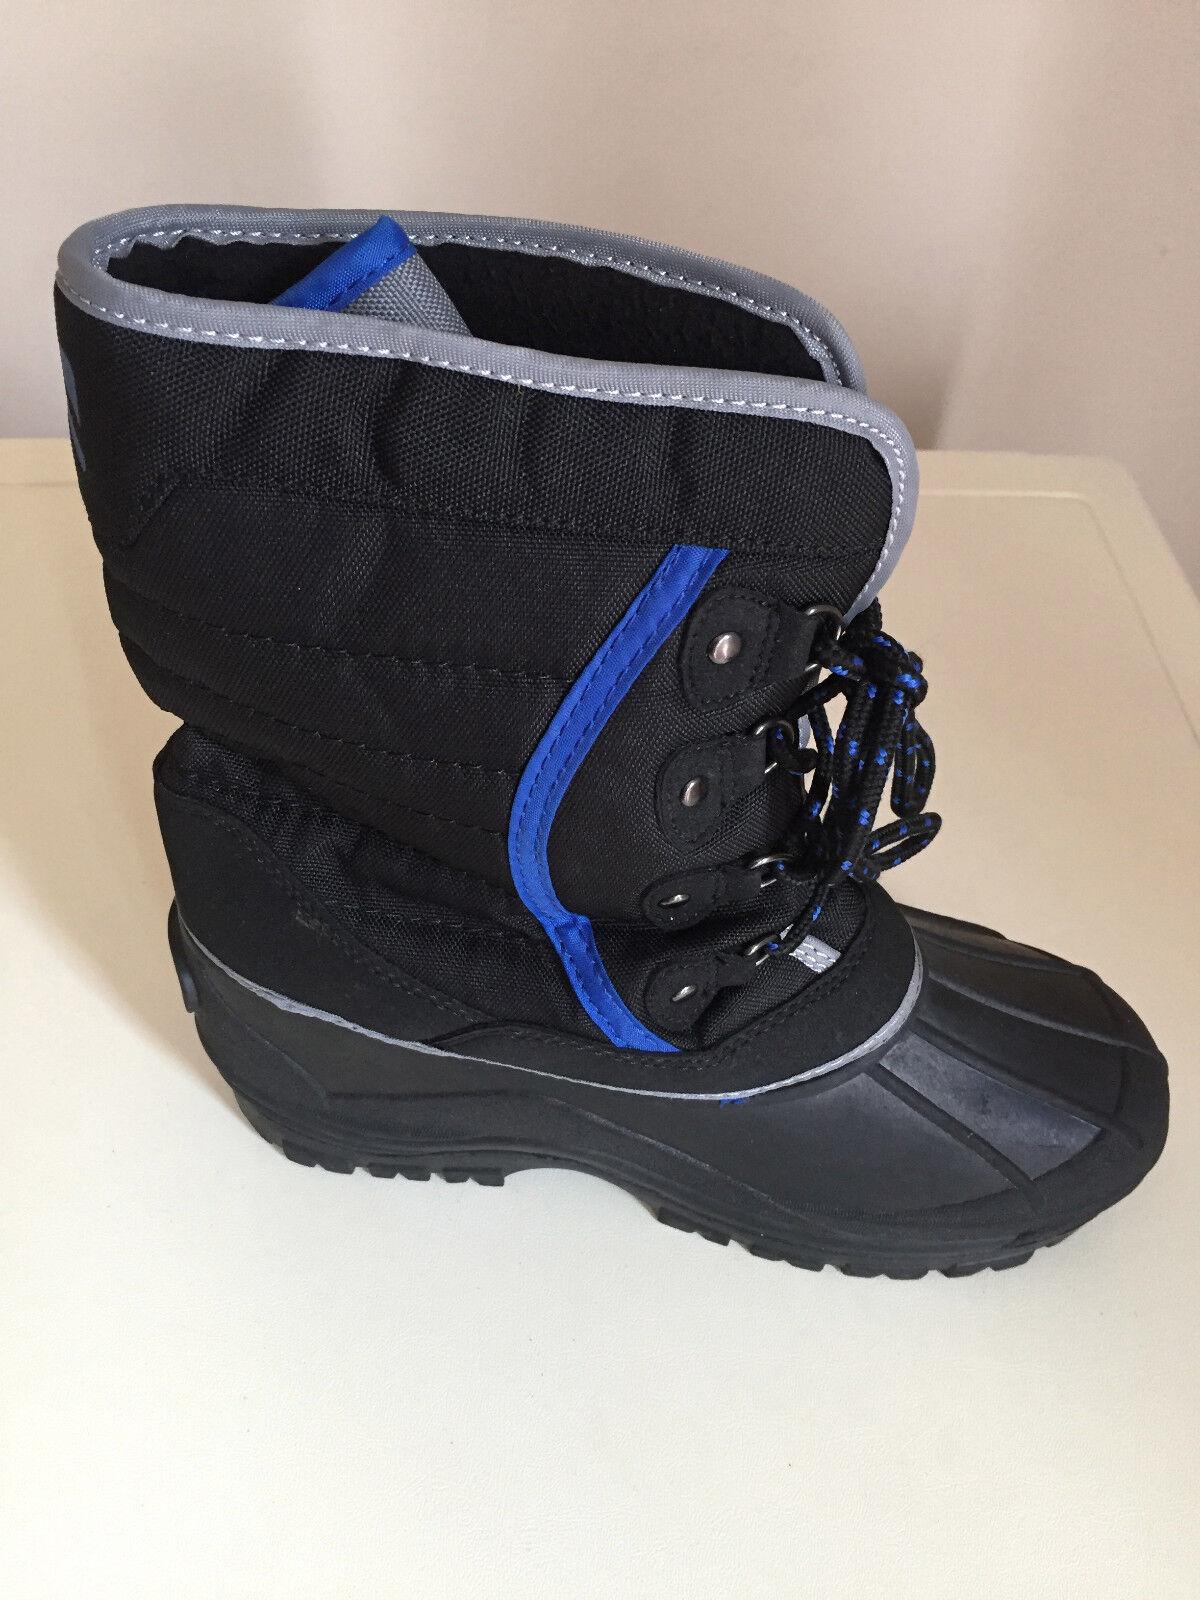 CAMPRI BLACK BLUE MEN/Boys/Girls/MEN/WOMEN Snow Boots Boots Snow Size 3 BRAND NEW bc8076